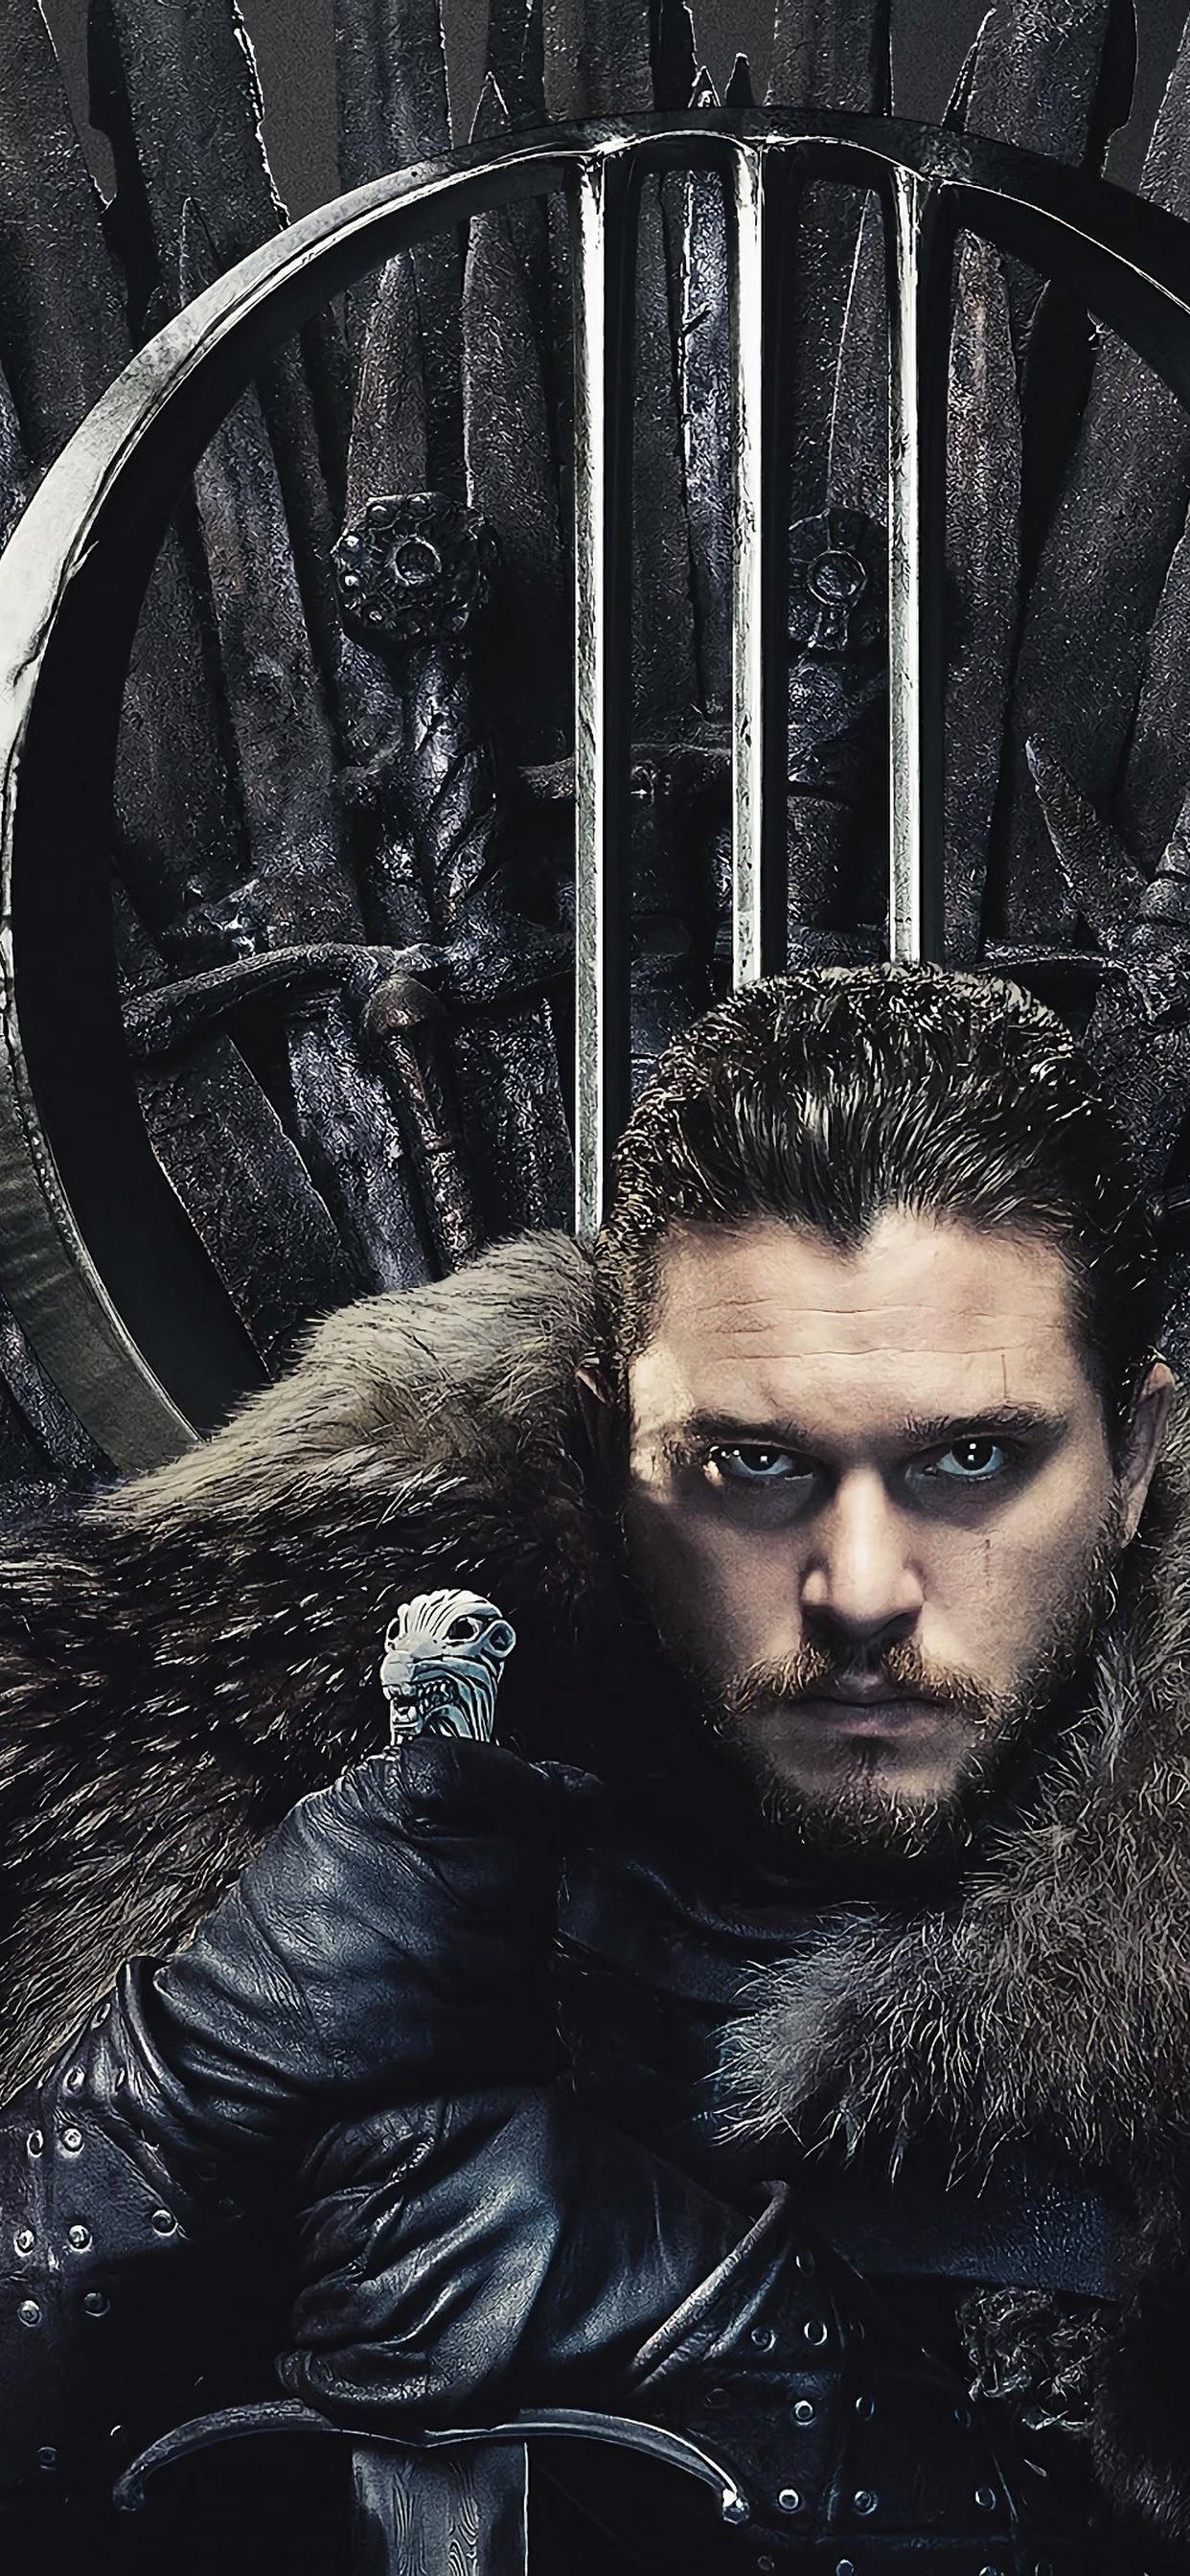 Jon Snow Game Of Thrones Season 8 4k Wallpaper 30